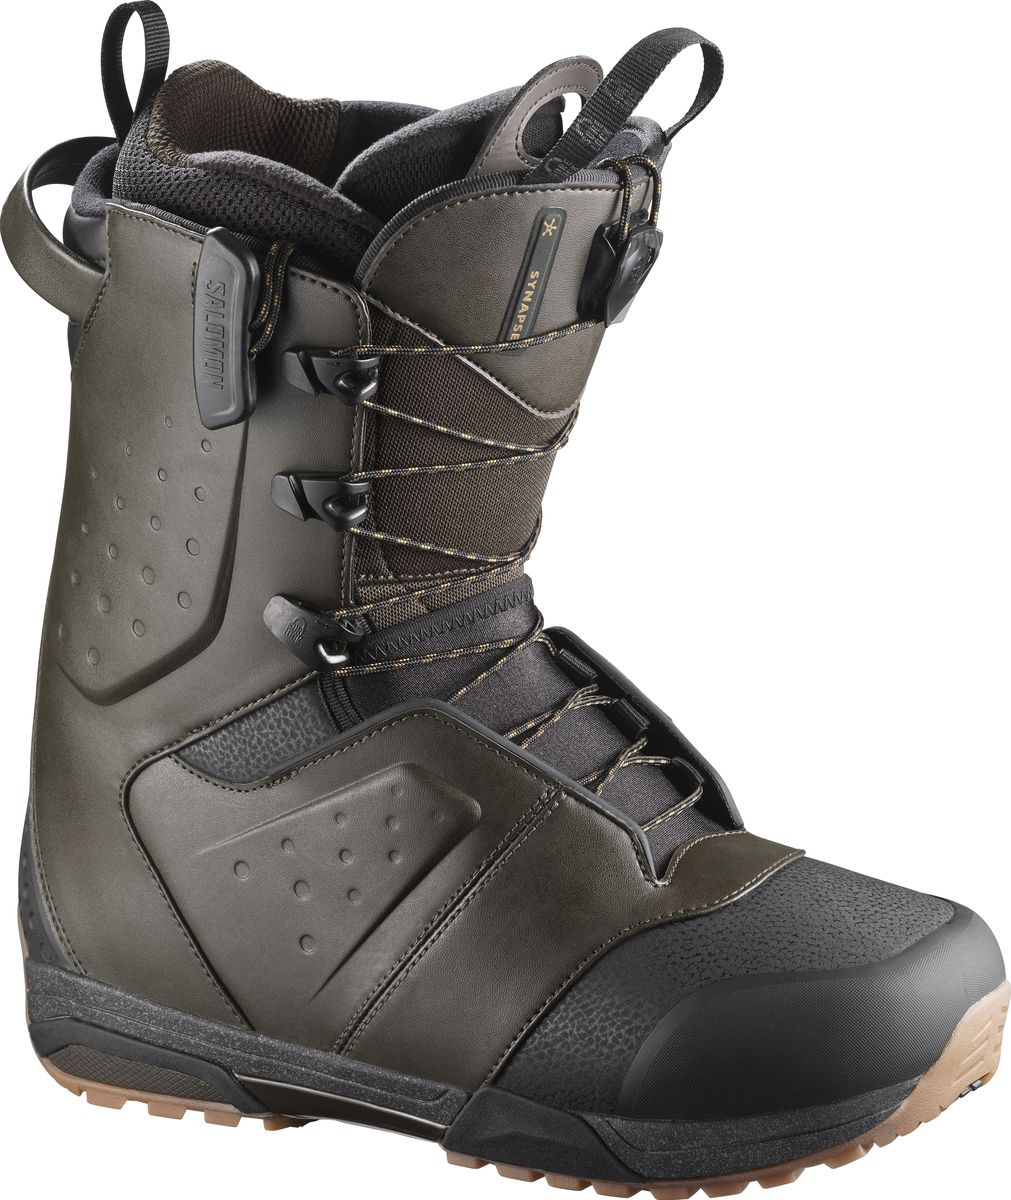 "Ботинки для сноуборда Salomon ""Synapse"", цвет: темно-зеленый. Размер 30,5 (46,5)"